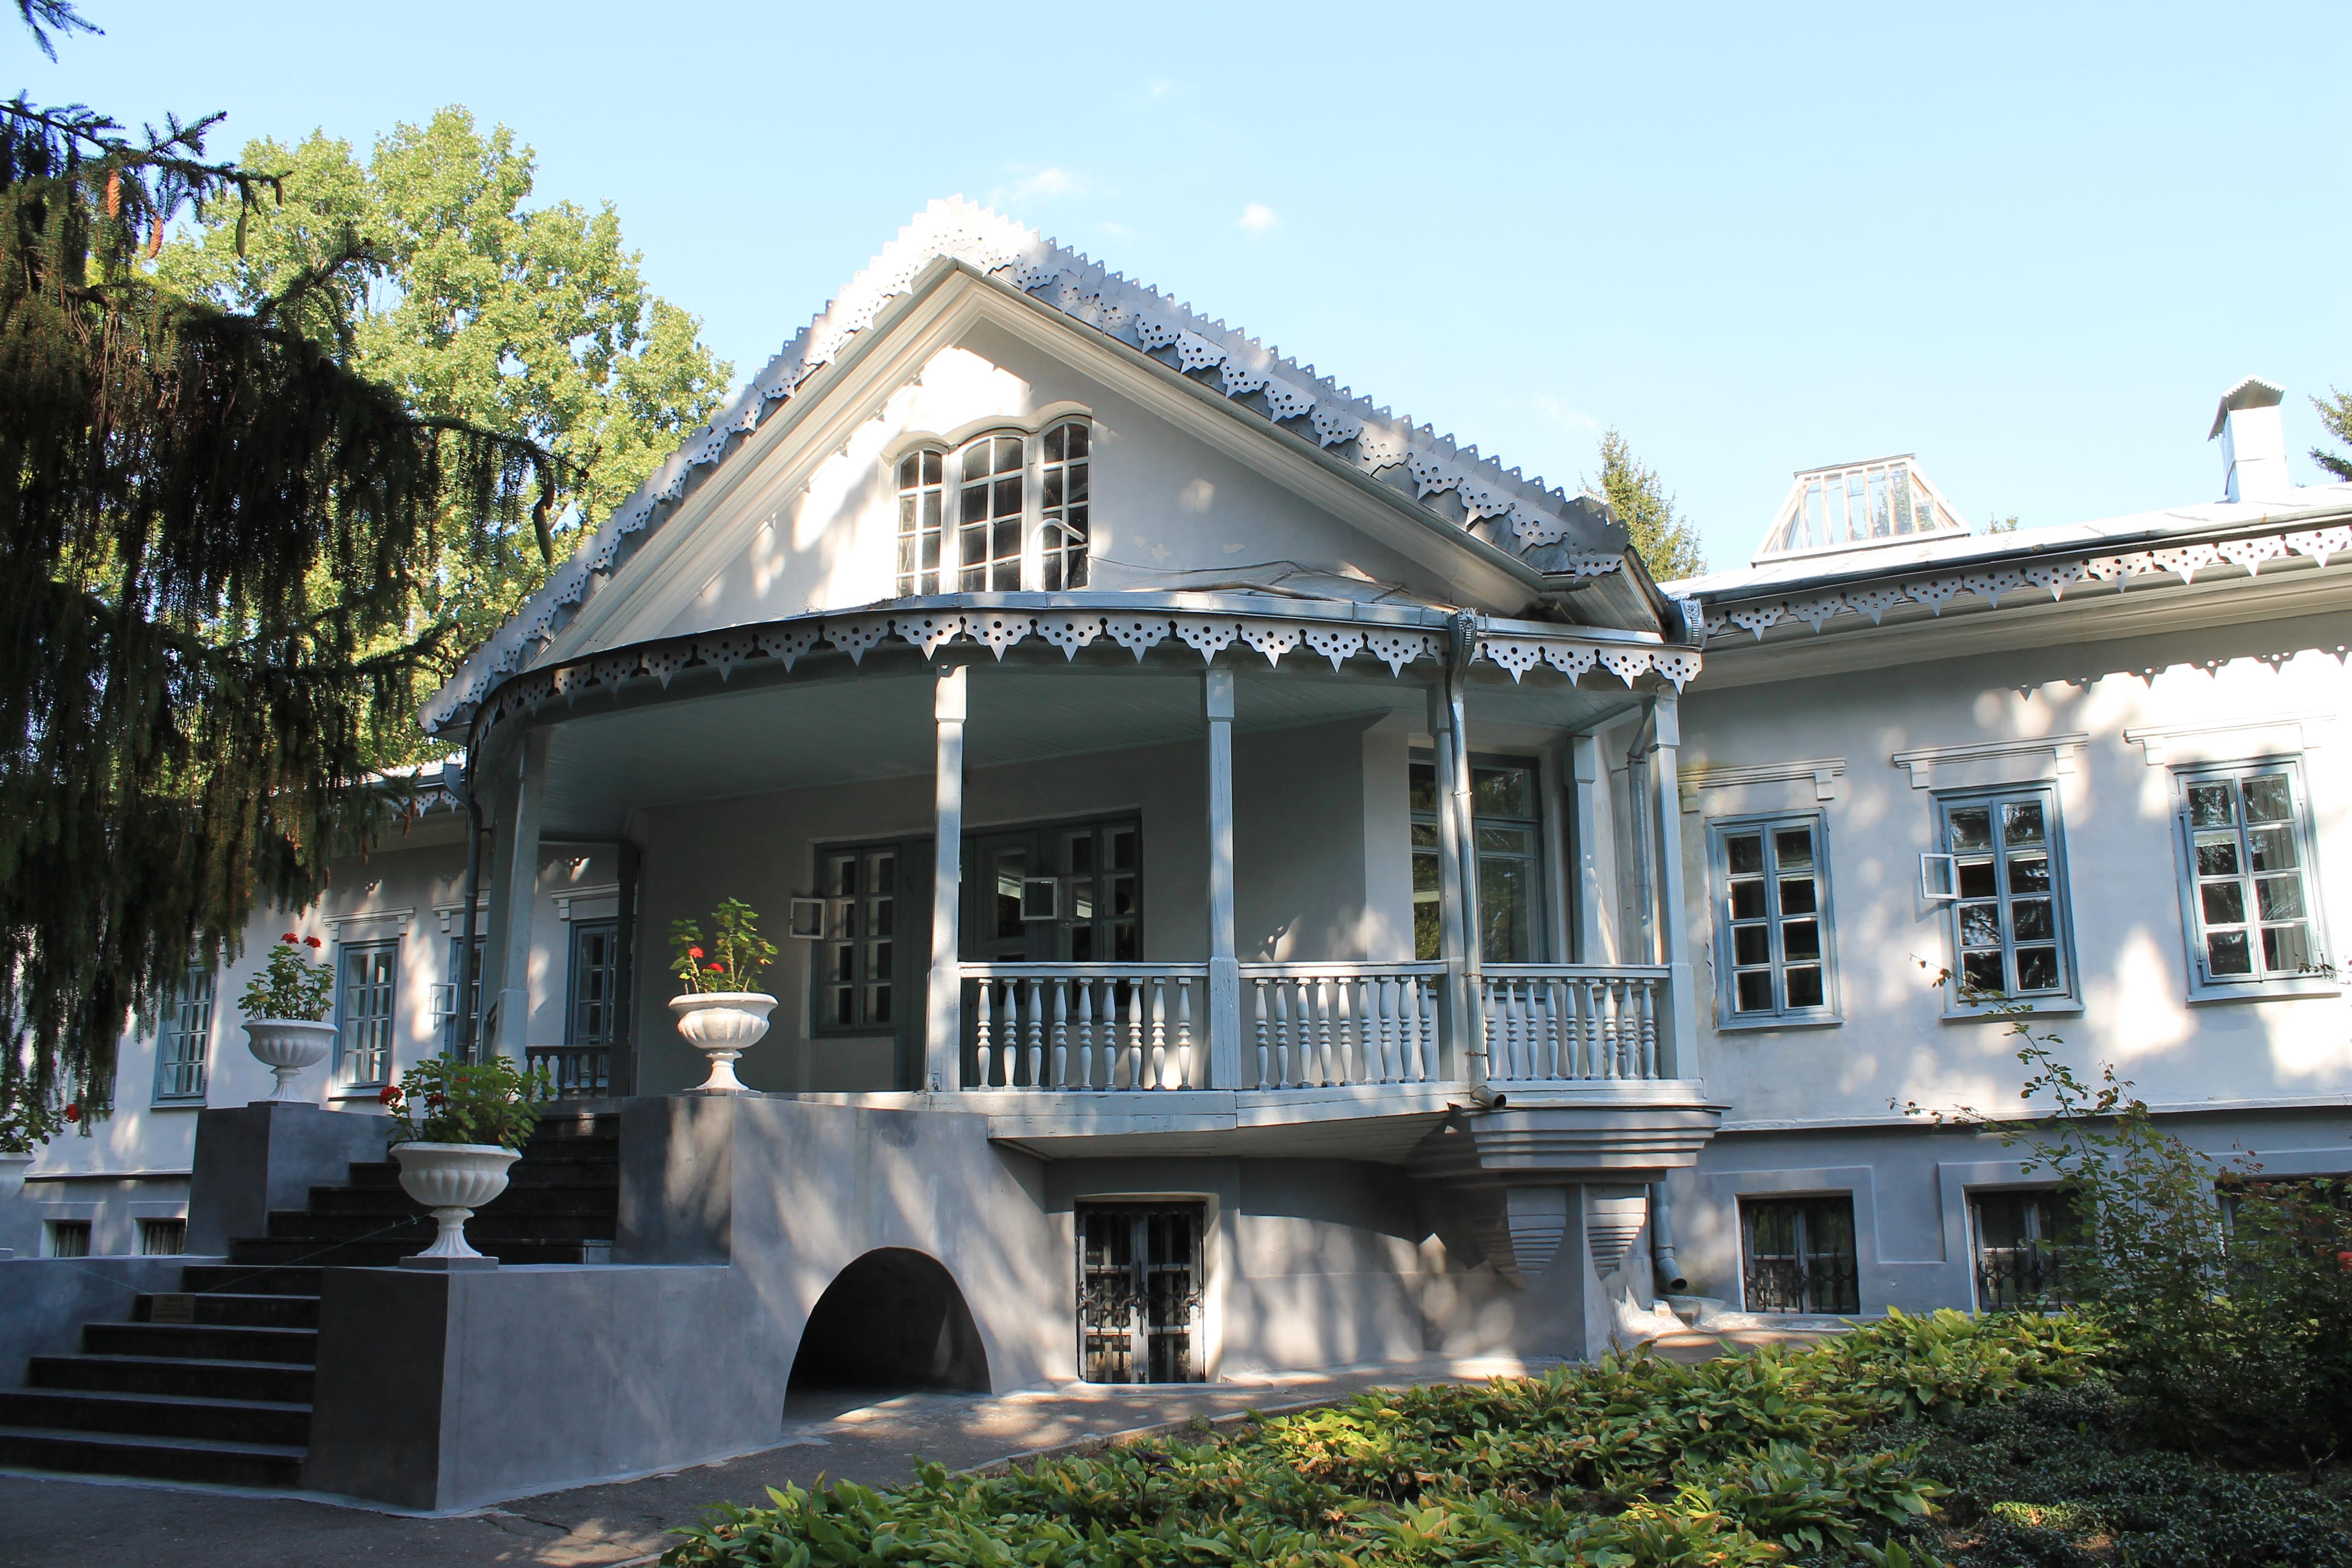 Музеи-усадьба Н. И. Пирогова